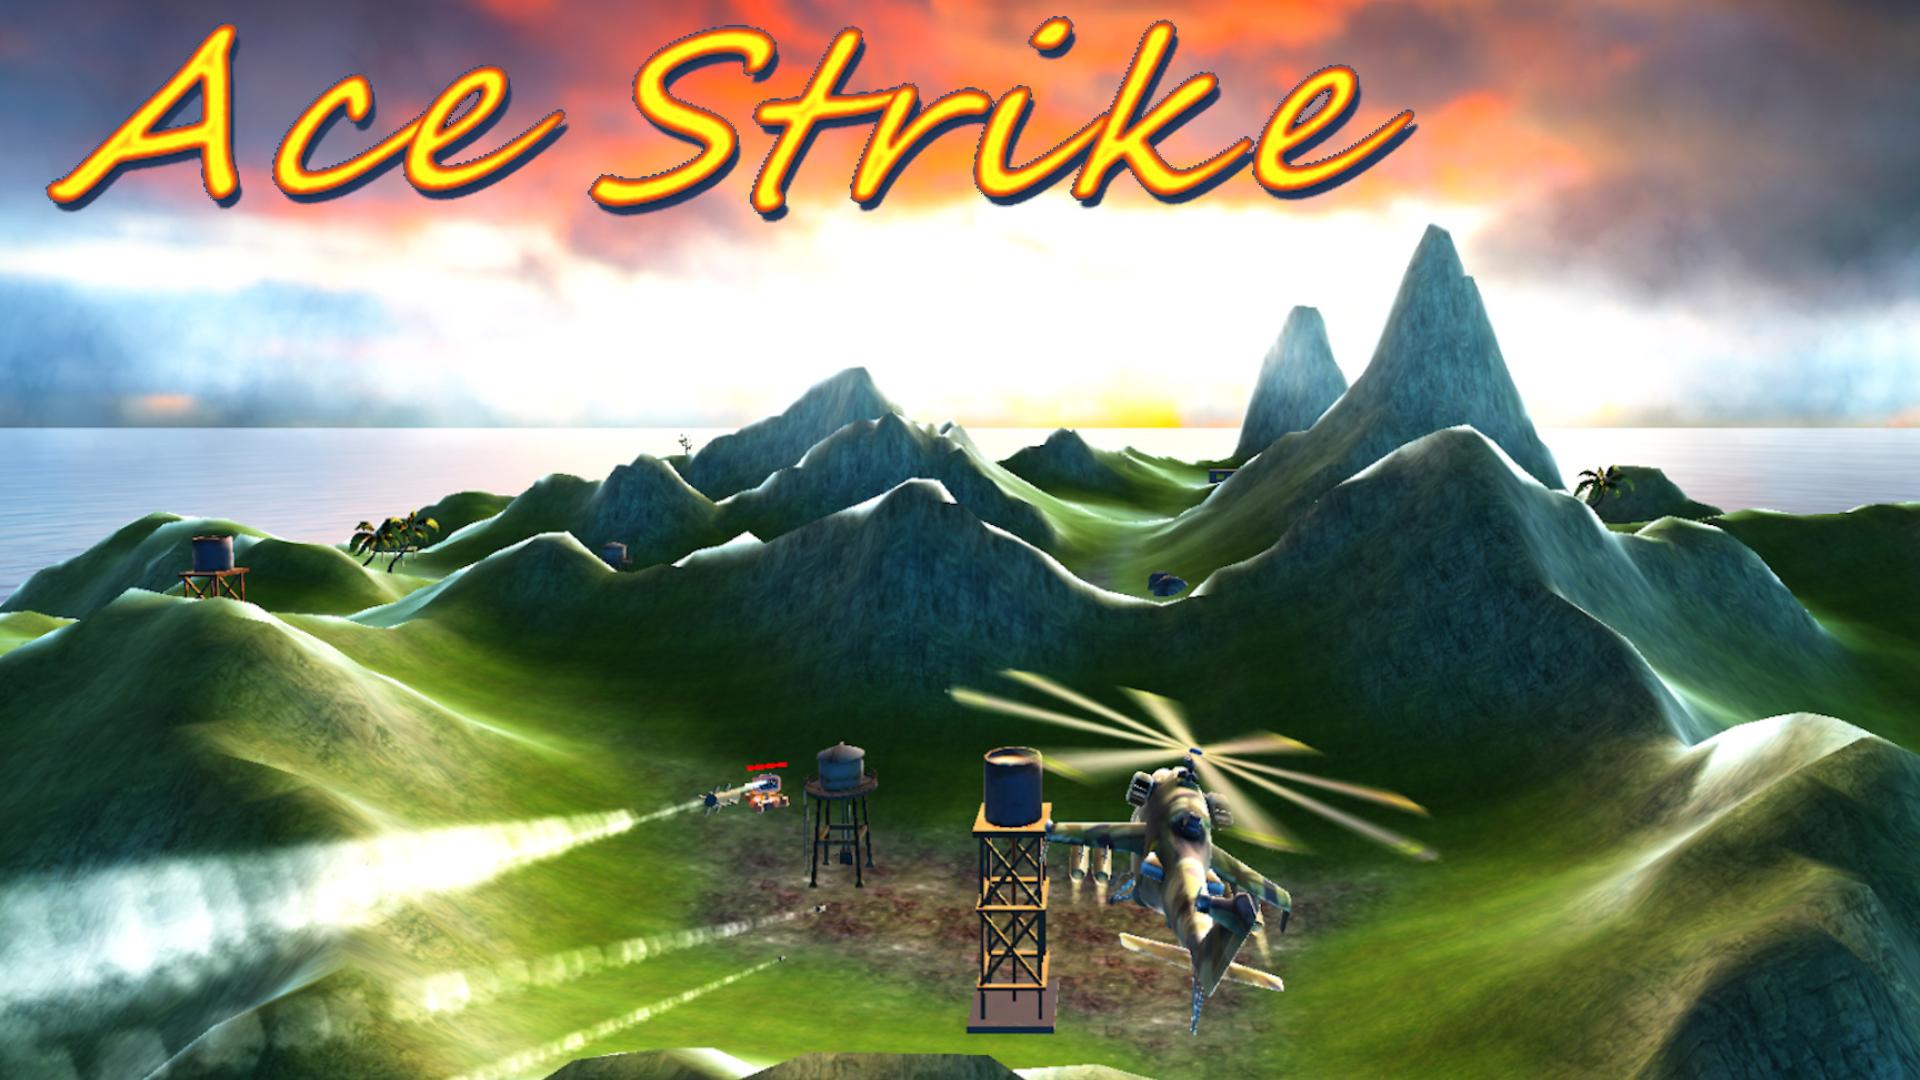 Nintendo eShop - Ace Strike